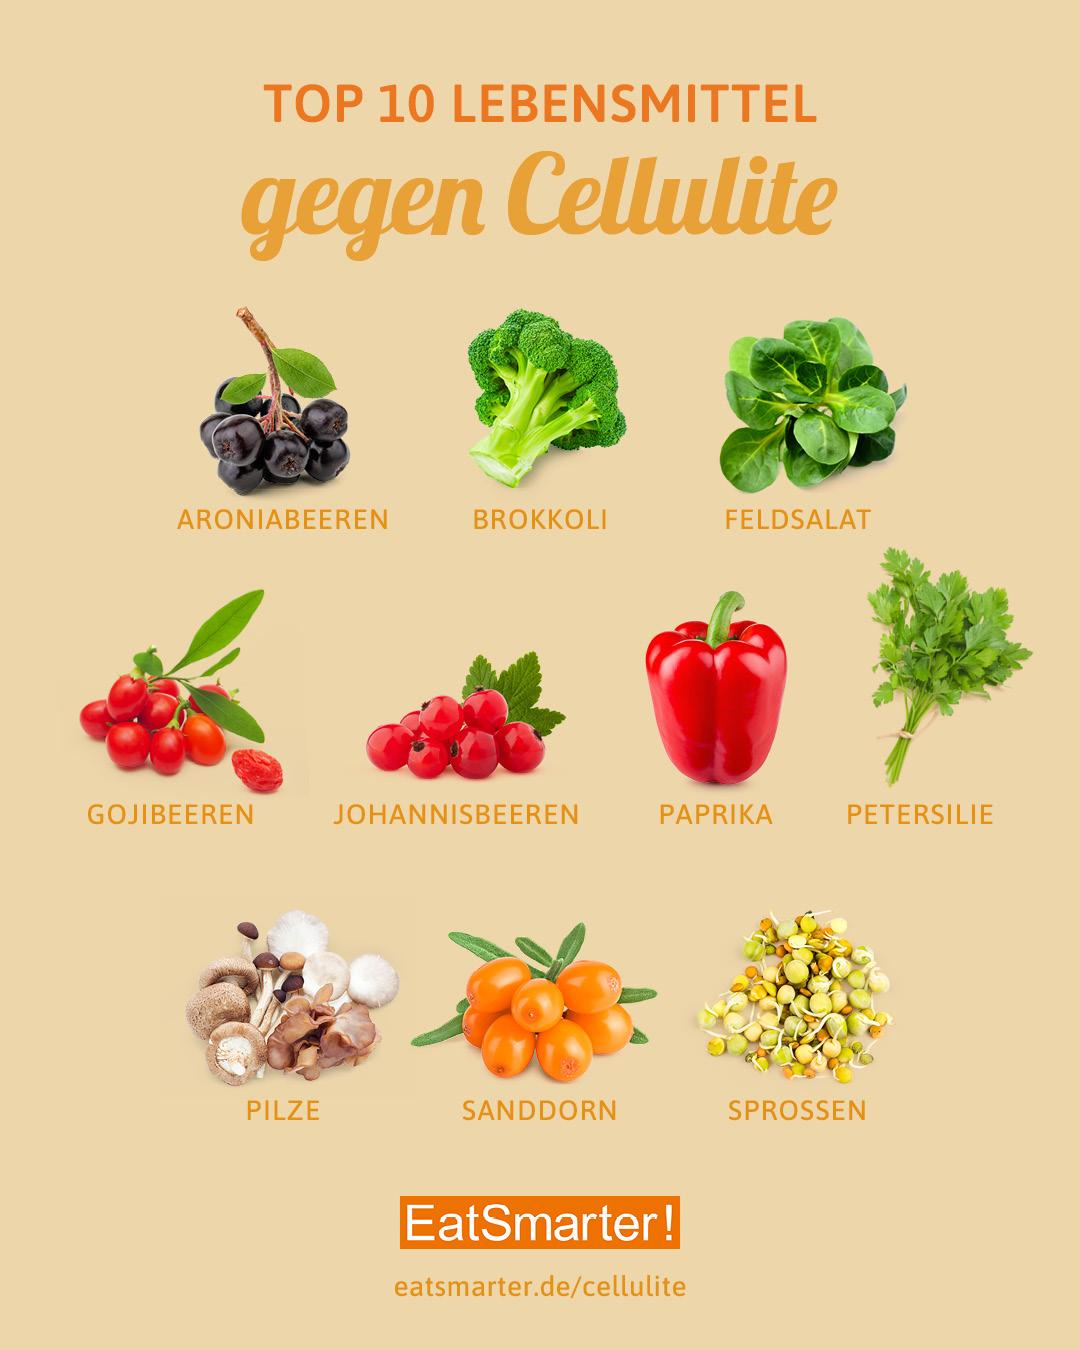 Lebensmittel gegen Cellulite